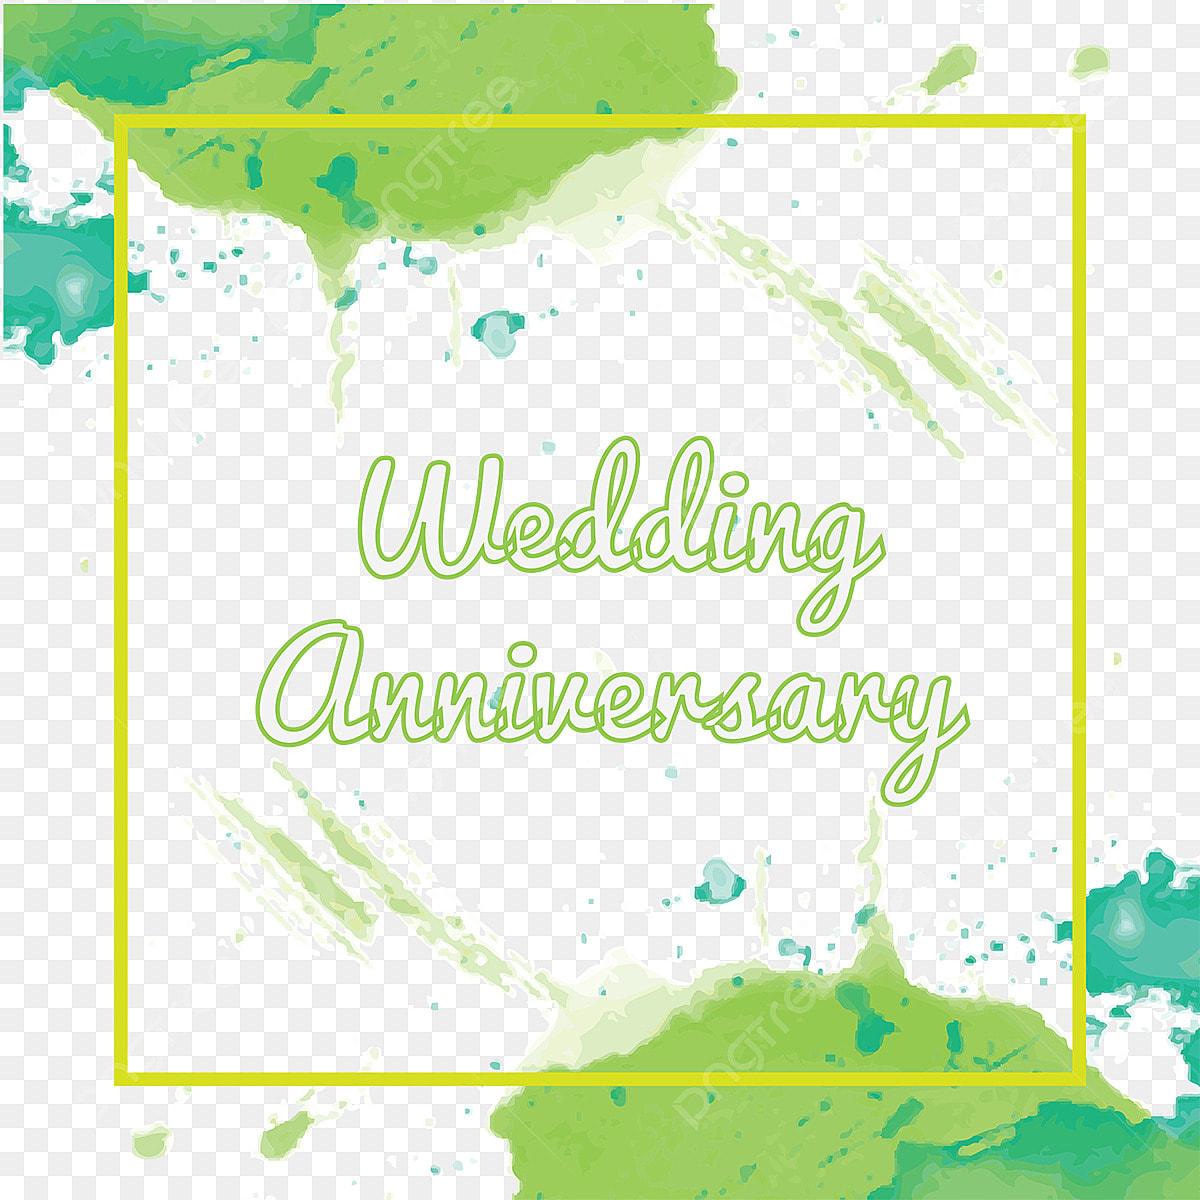 Watercolor Wedding Anniversary Color Splash Floral Frame